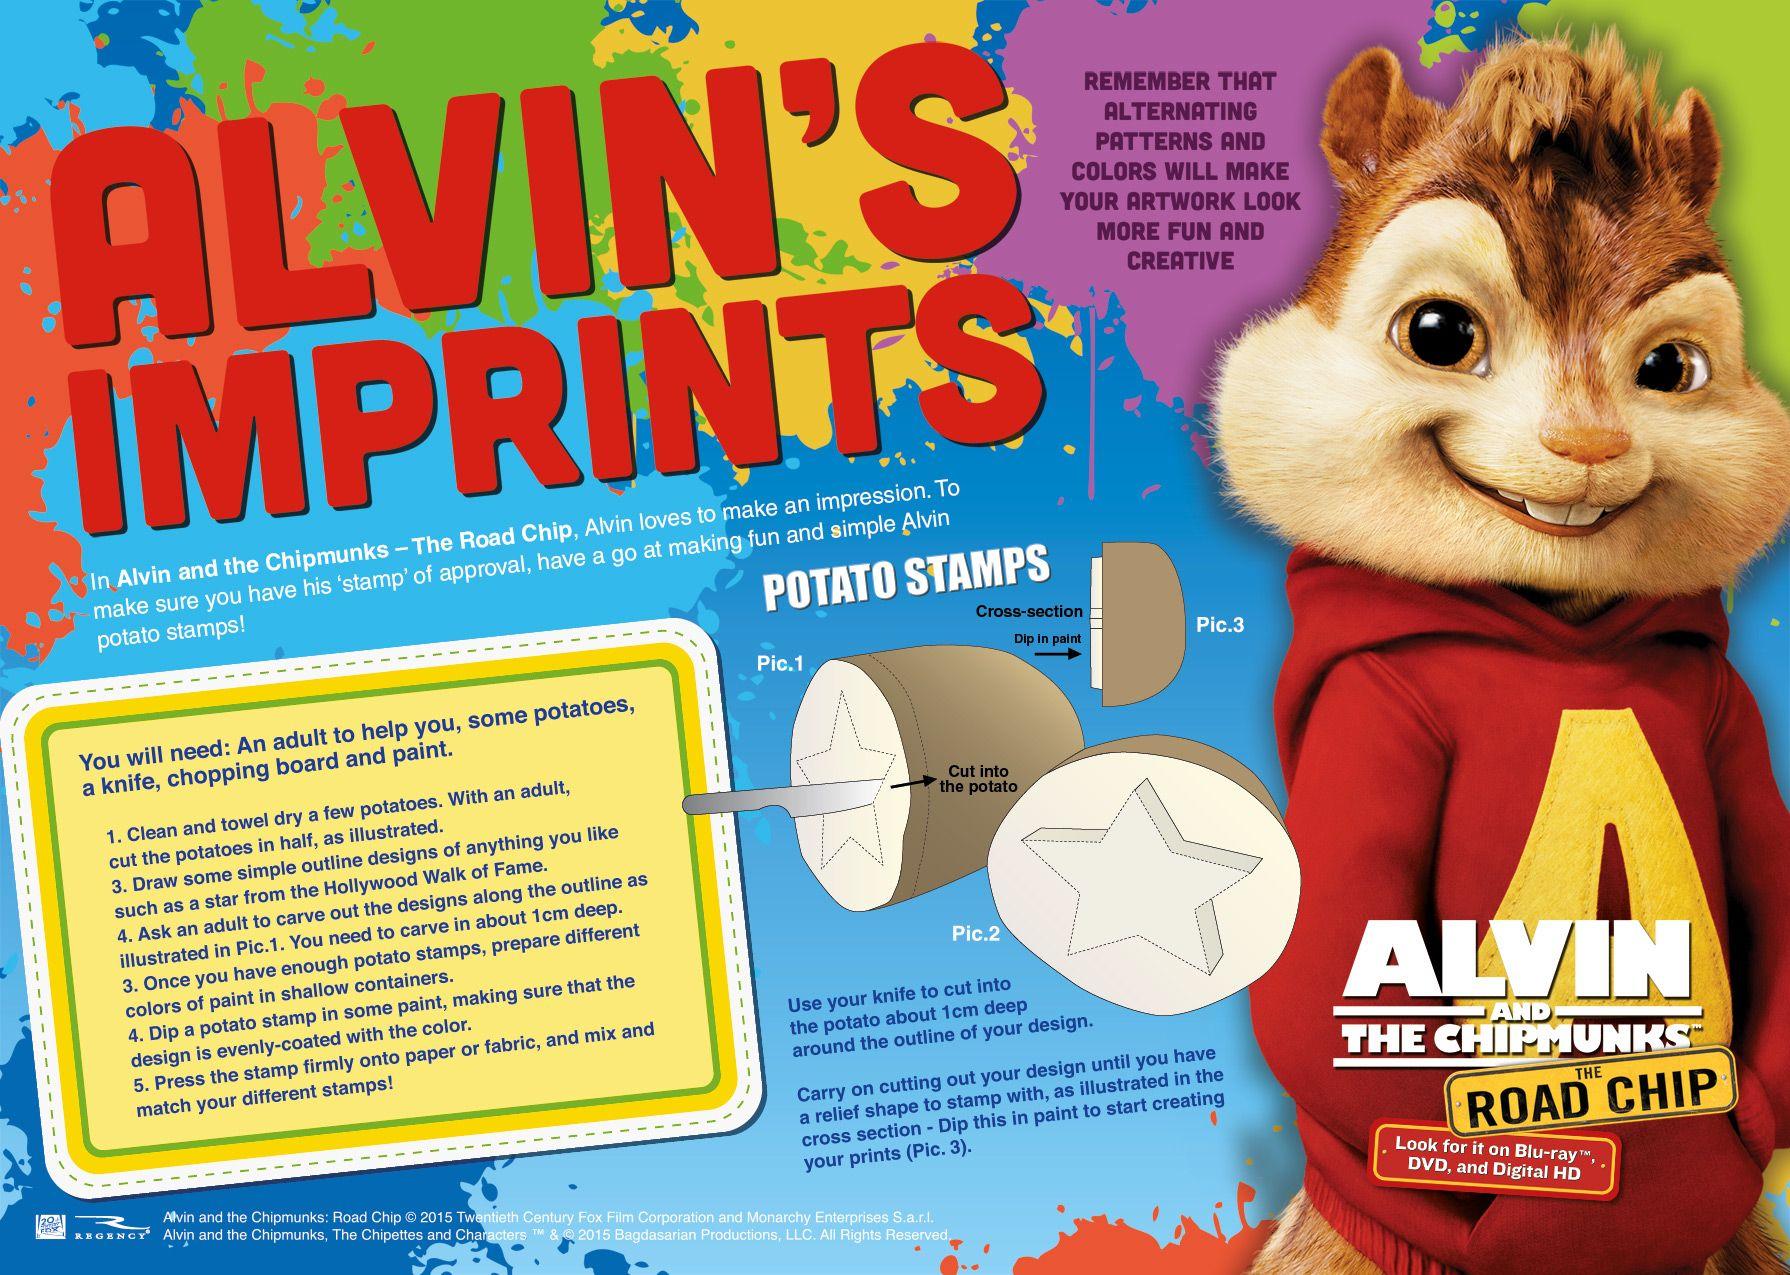 Pin by LMI KIDS on Alvin & the Chipmunks | Pinterest | Chipmunks